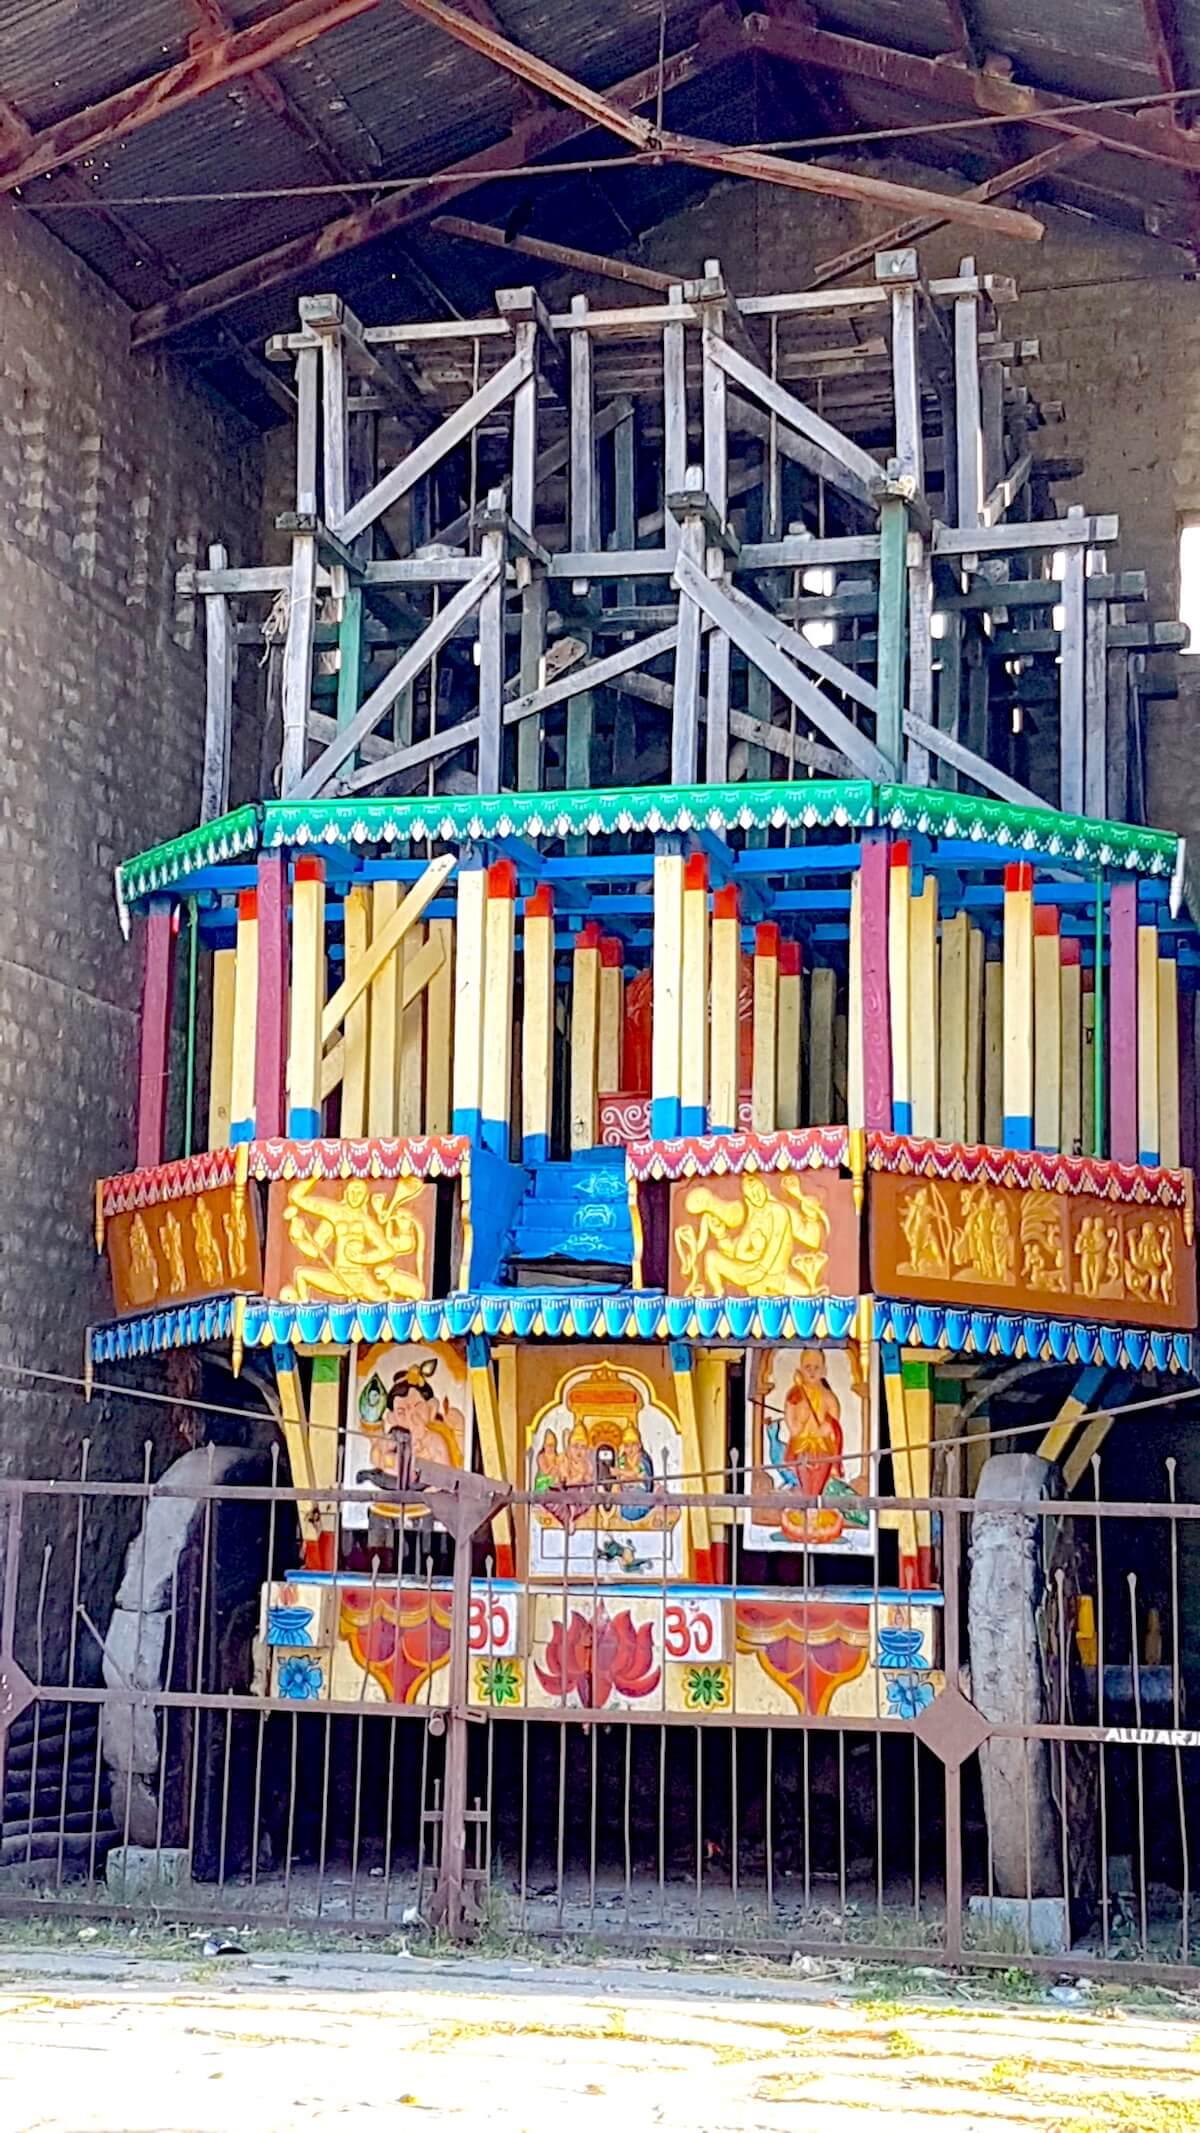 A closer look at the chariot from Ramalingeshwara temple